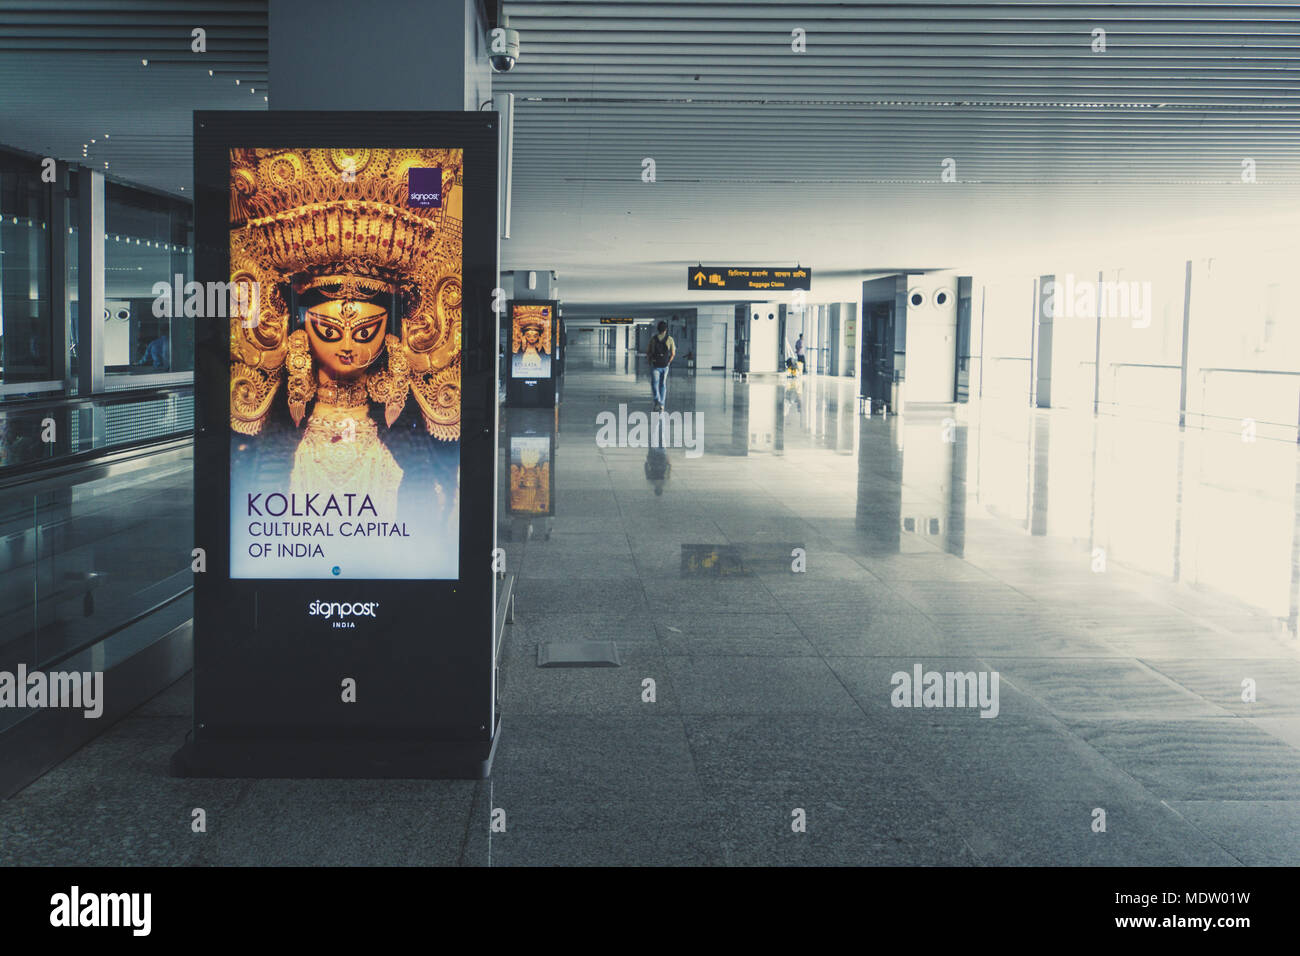 KOLKATA, INDIA - 26 January 2018. The new terminal of Arrival hall of Netaji Subhash Chandra Bose International Airport in Kolkata, West Bengal, India - Stock Image